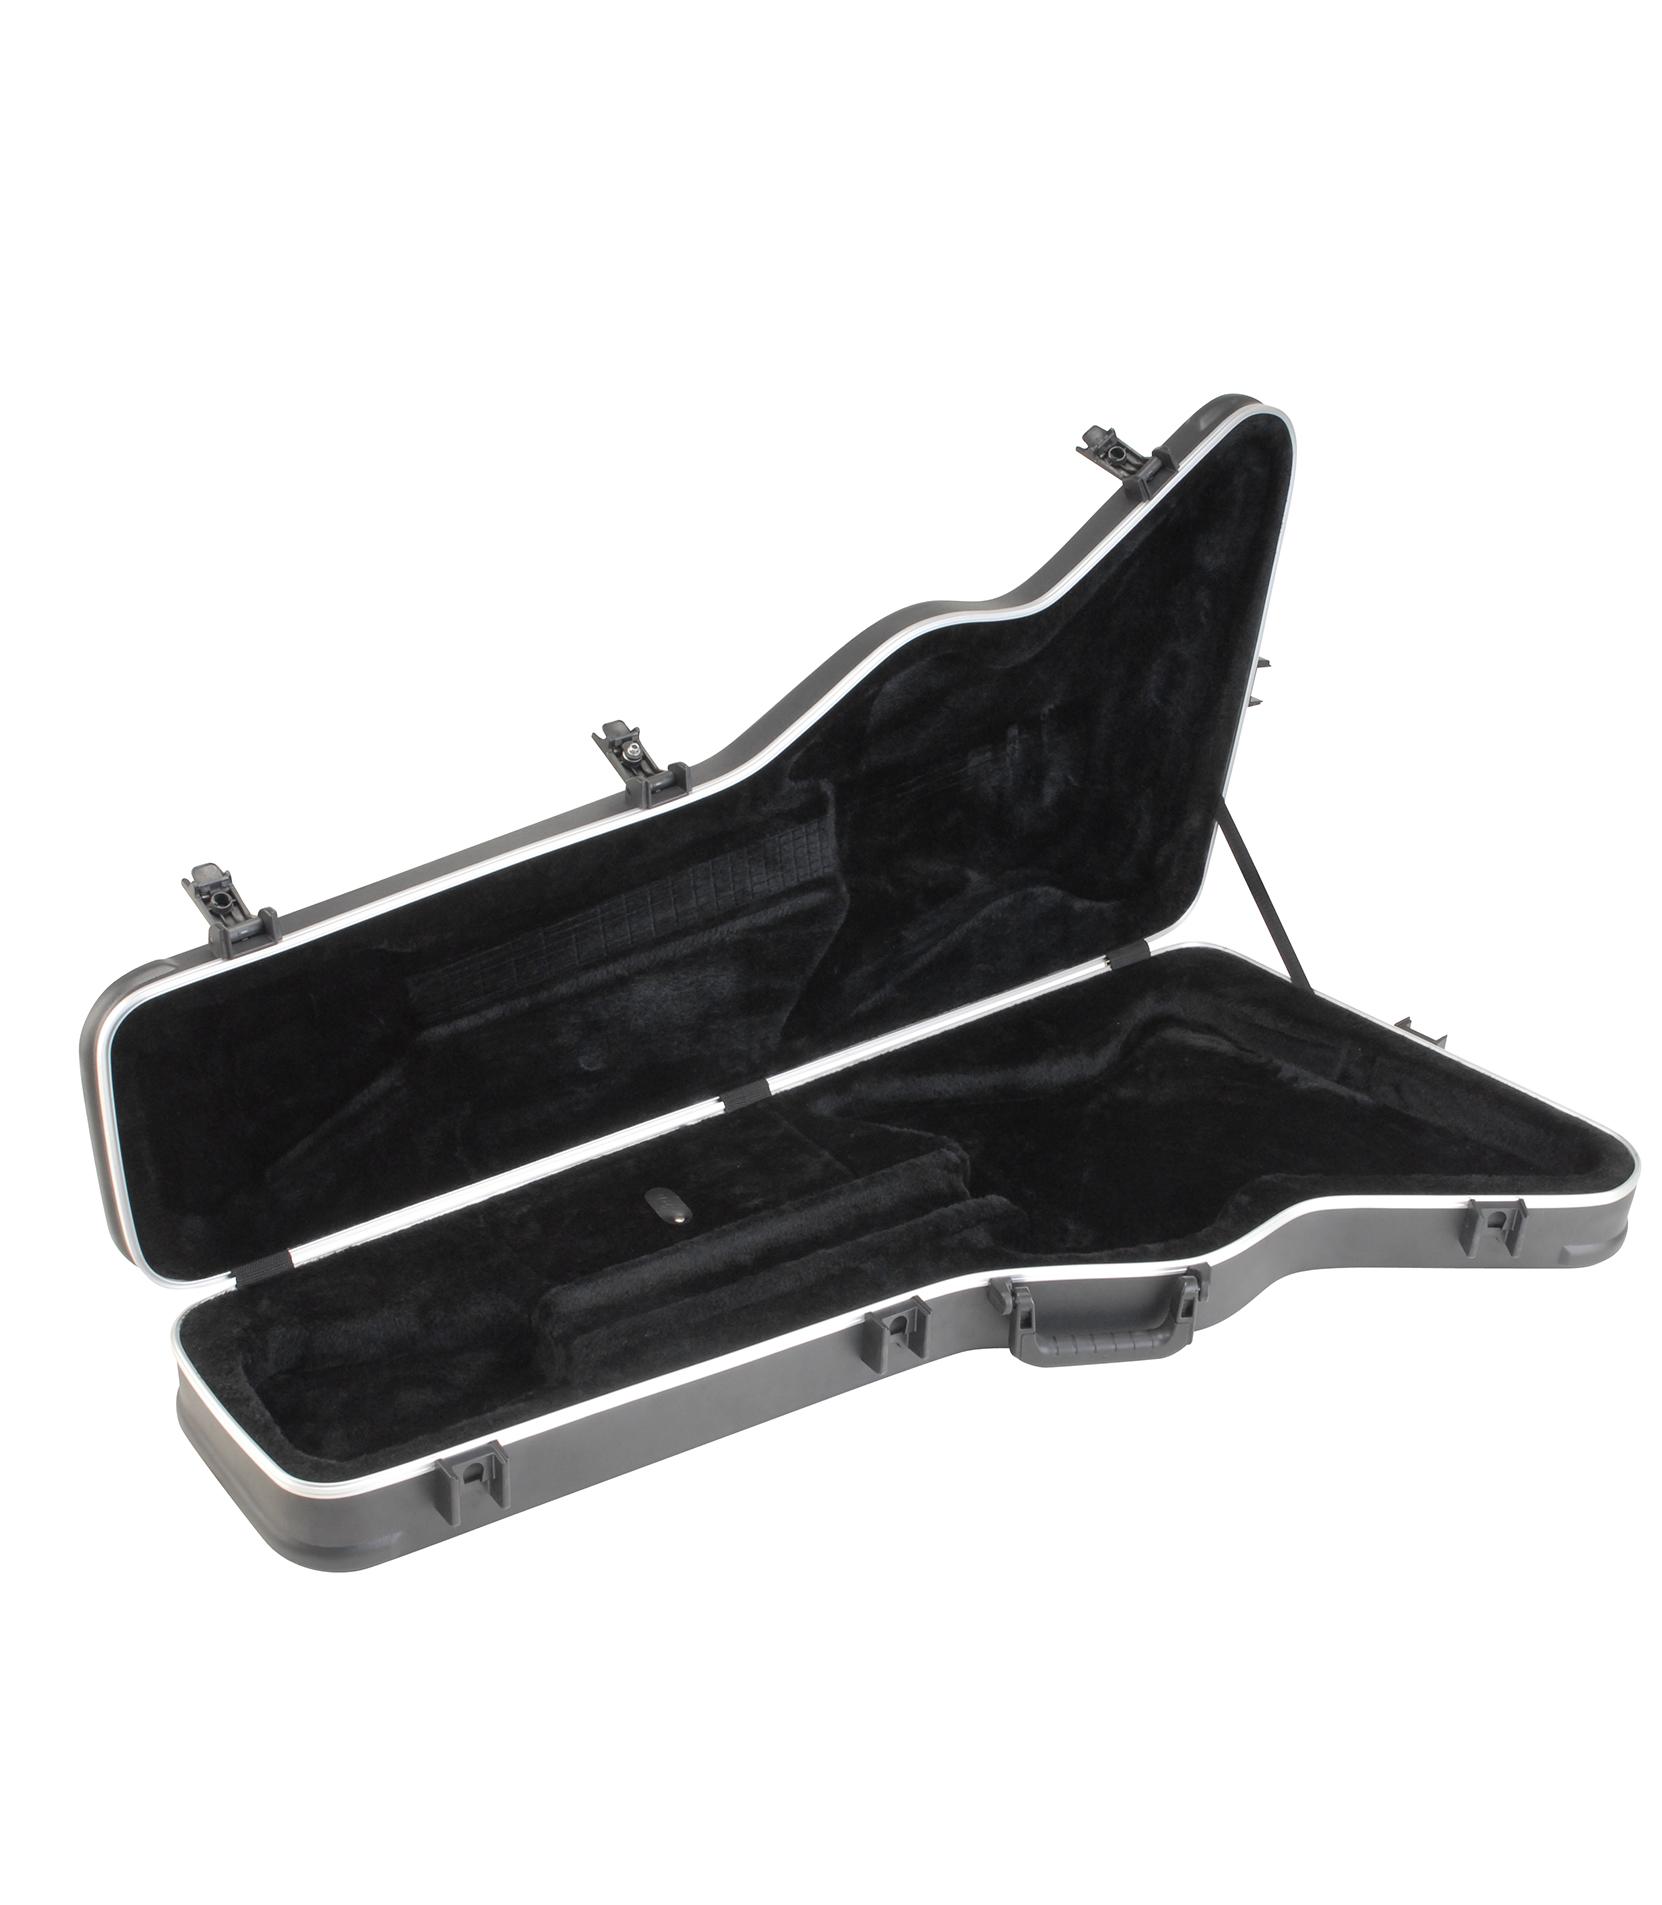 Melody House Musical Instruments Store - 1SKB 63 Explorer Firebird Type HardshellTSA La